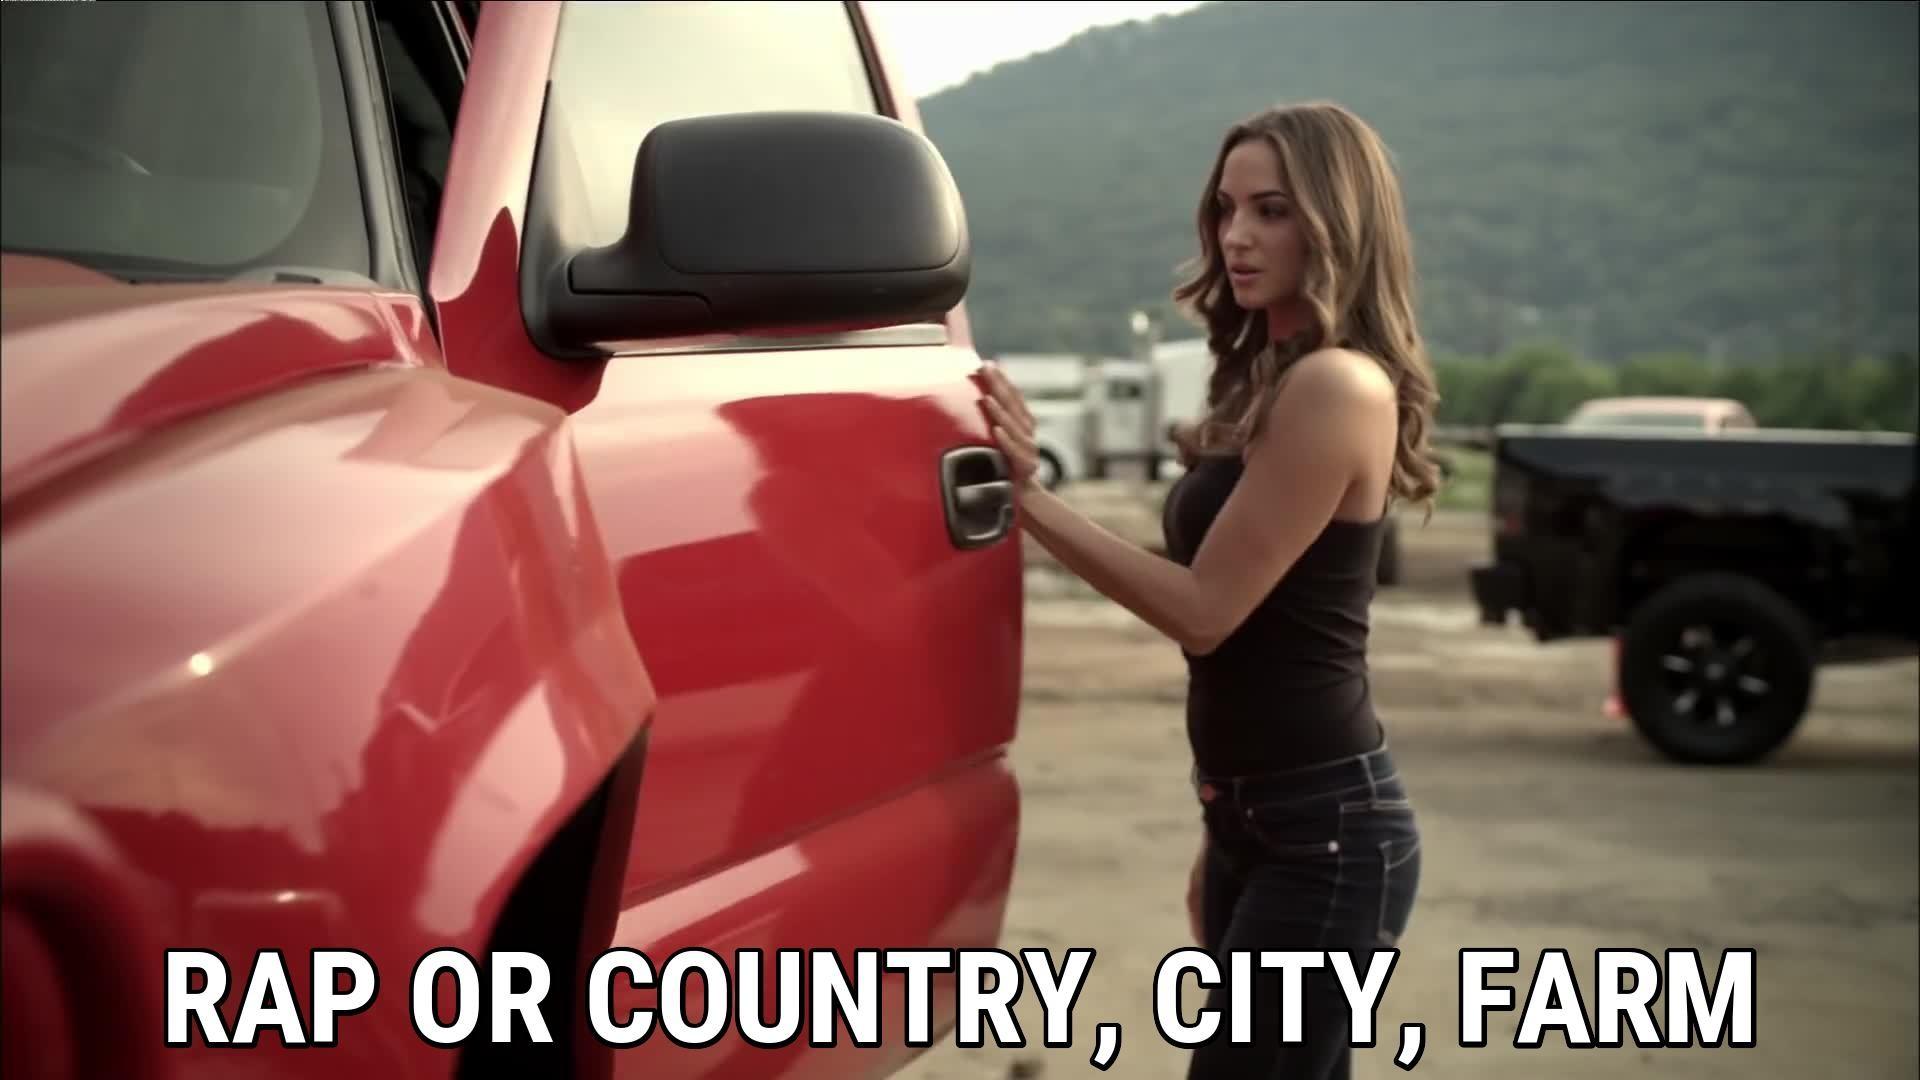 Rap or country, city, farm